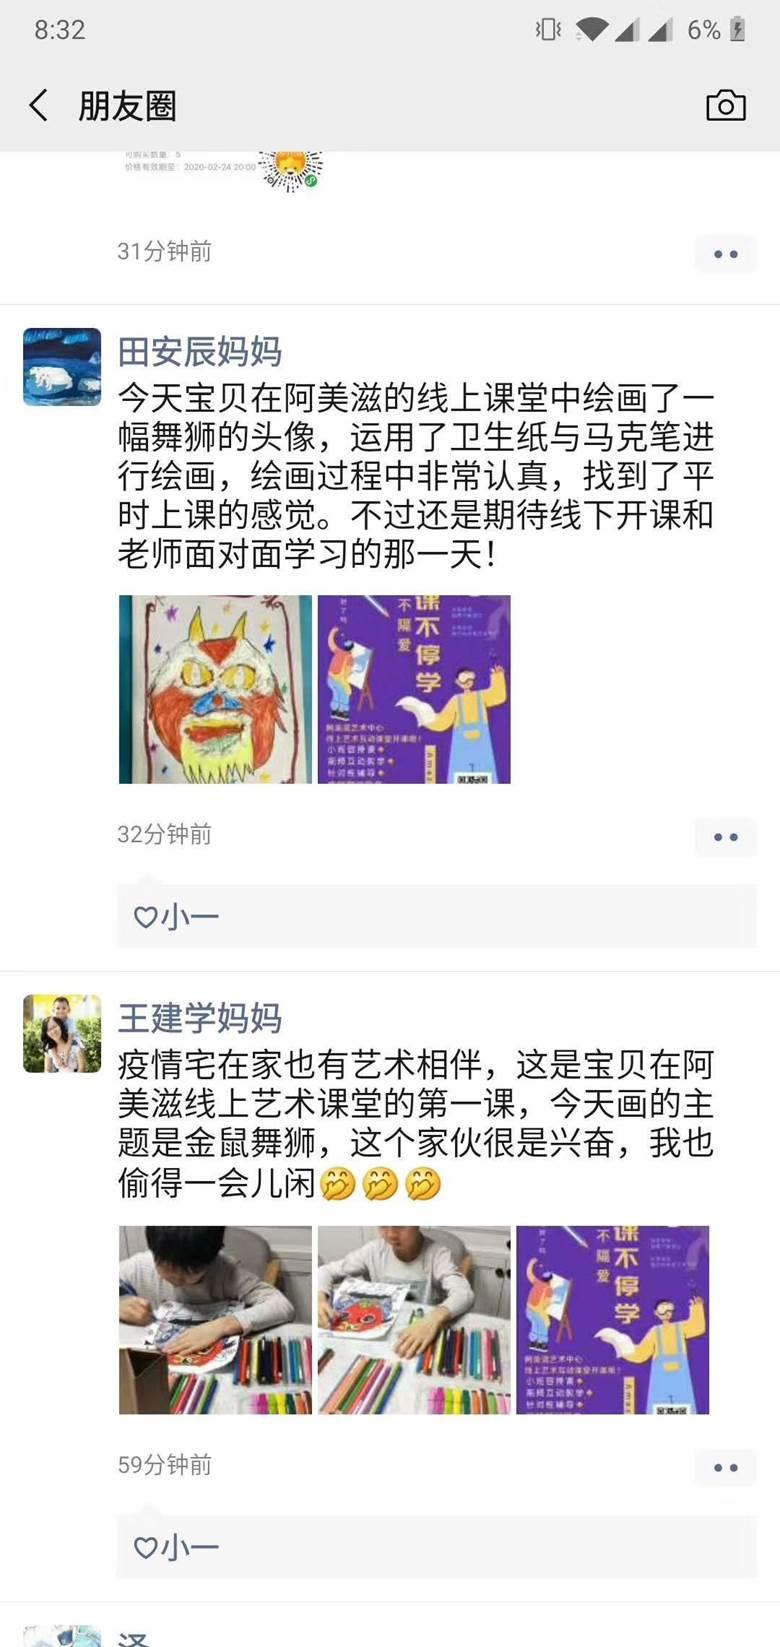 http://www.huodongxing.com/file/20200224/2303706912221/573706945191438.jpg